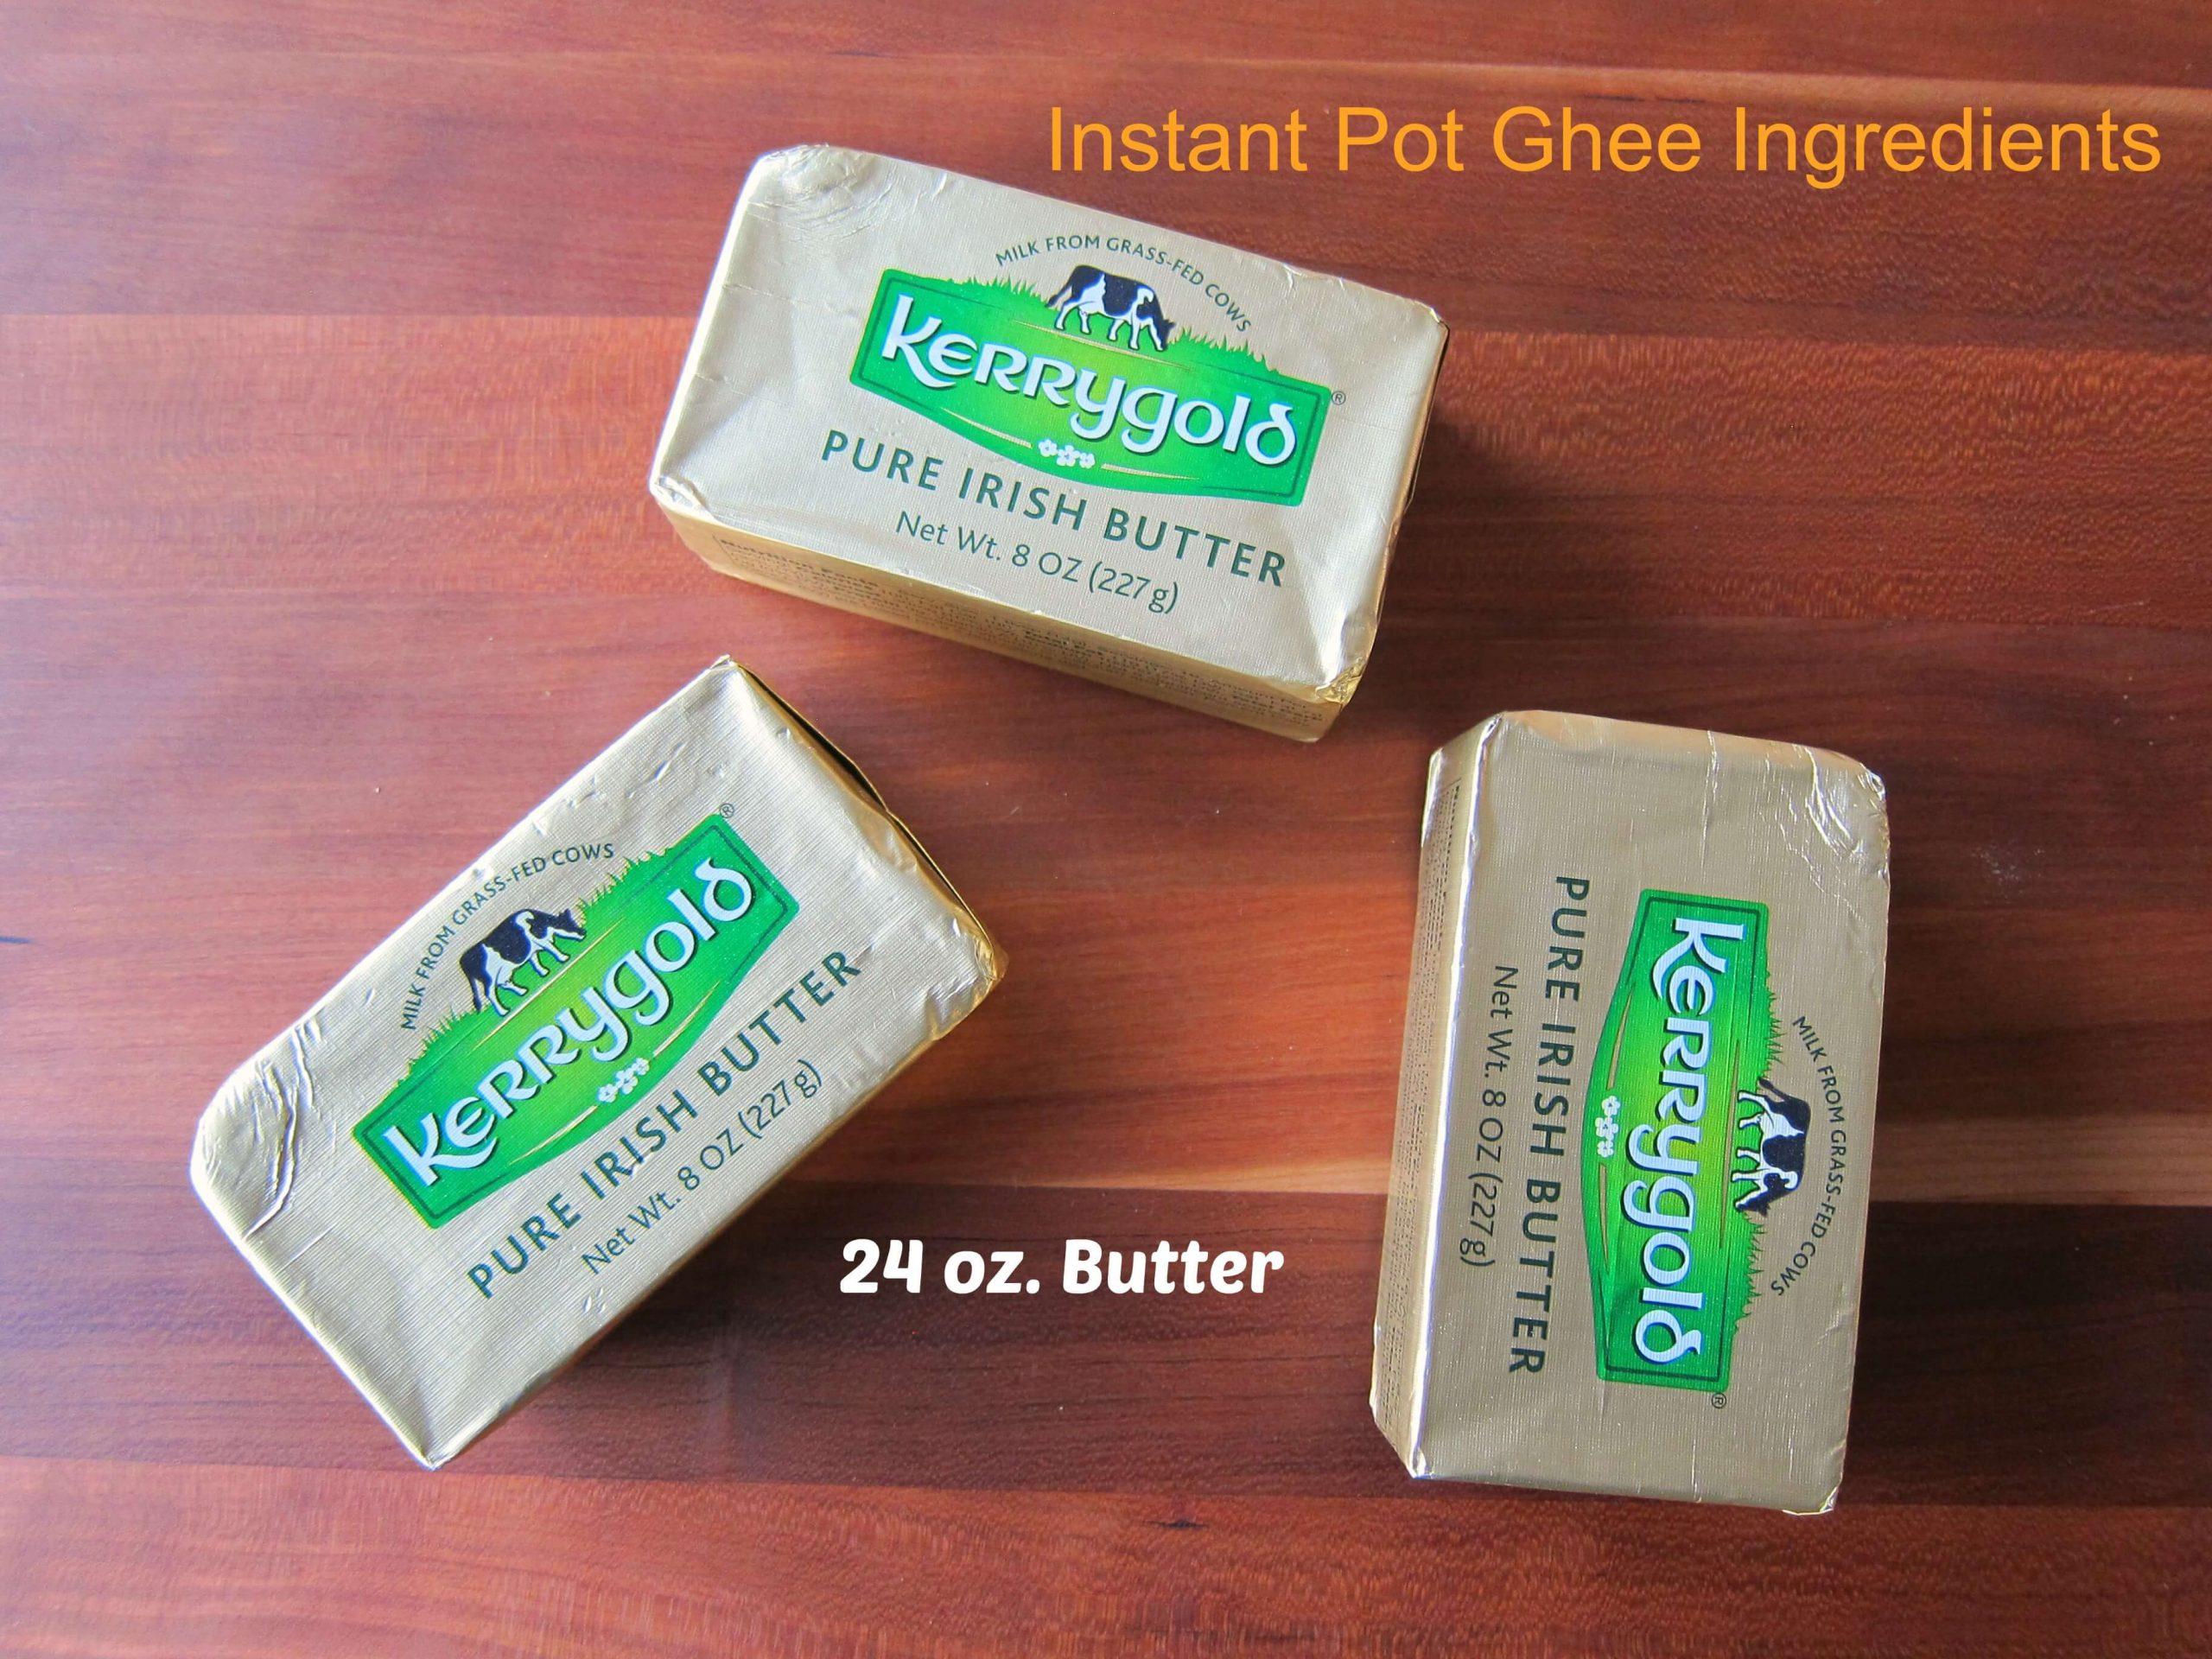 Instant Pot Ghee Ingredients  - 3 sticks of Kerrygold butter